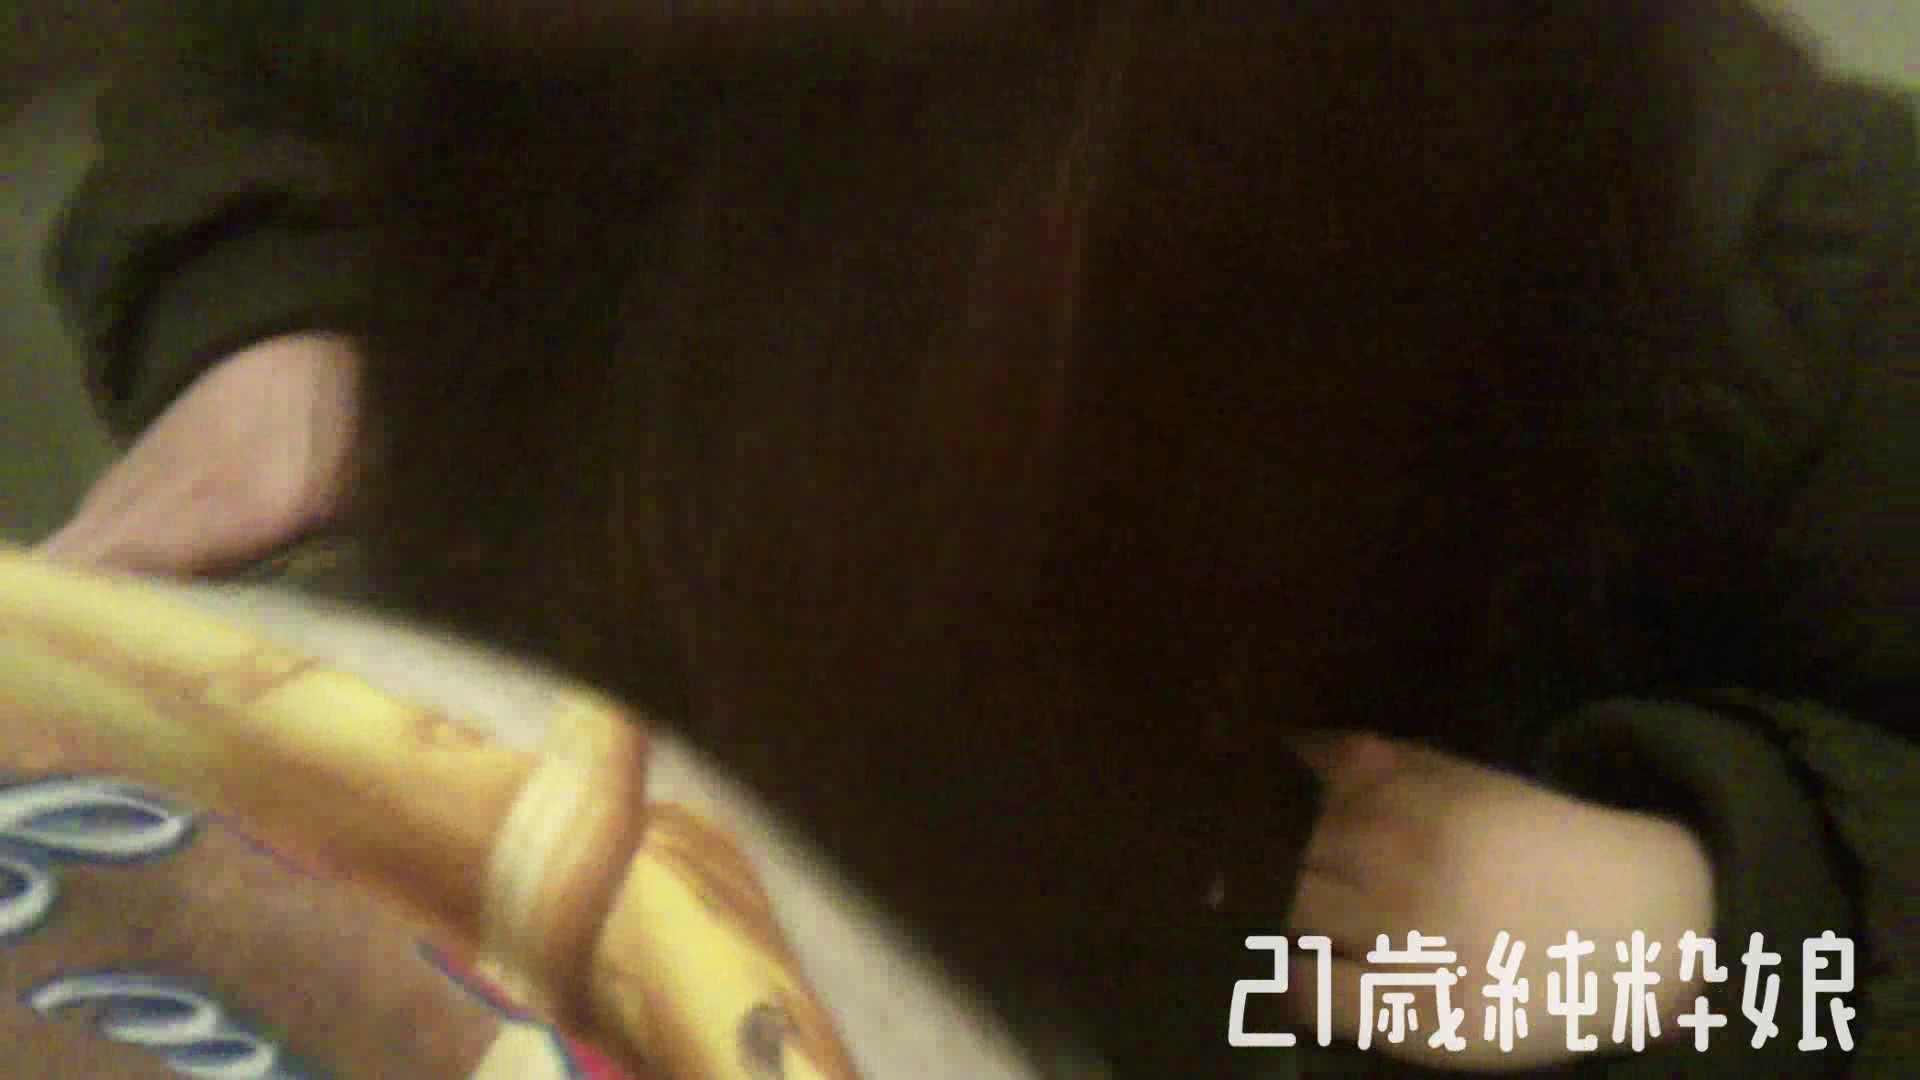 Gカップ21歳純粋嬢第2弾Vol.5 OLヌード天国  110PIX 72